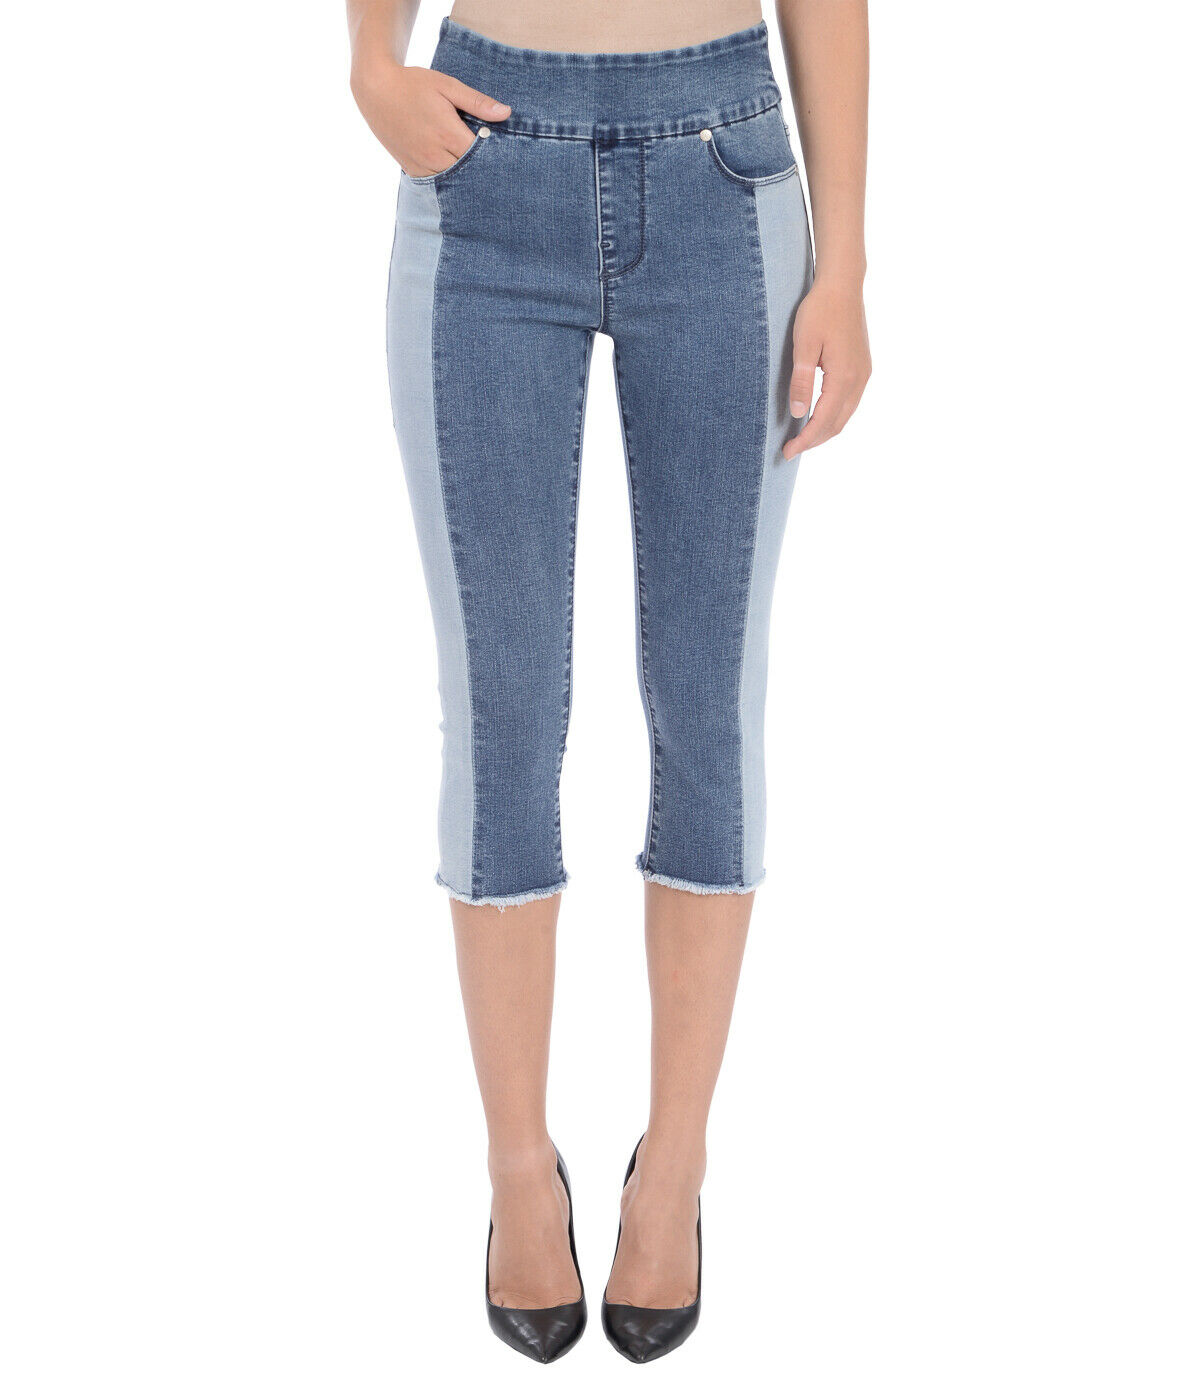 LOLA Jeans high rise pull on 4 way stretch denim capri 2 tone size 14   33